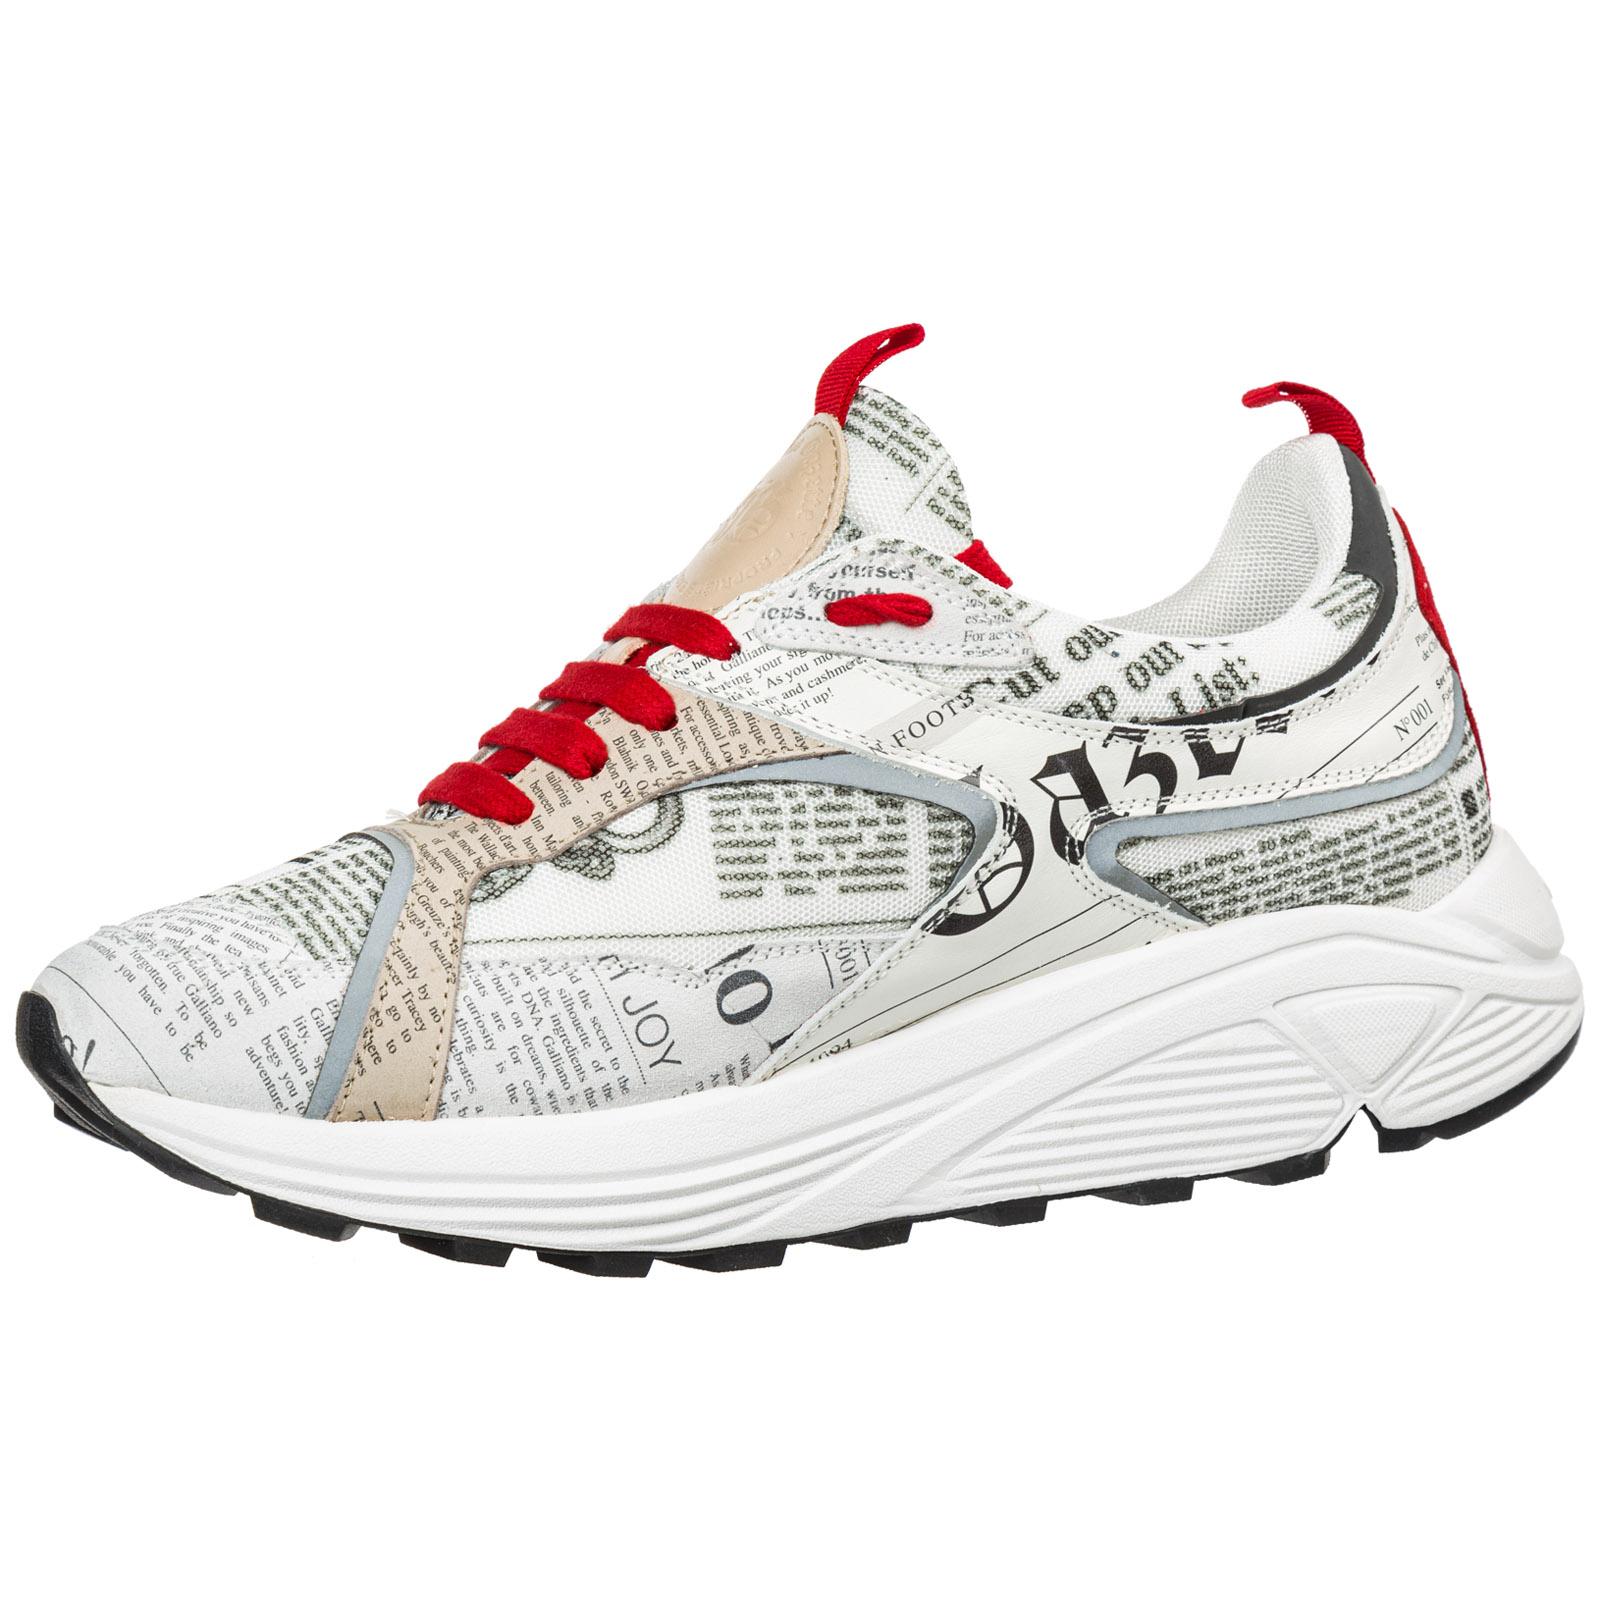 reputable site 0322e ea0d6 Scarpe sneakers uomo in pelle